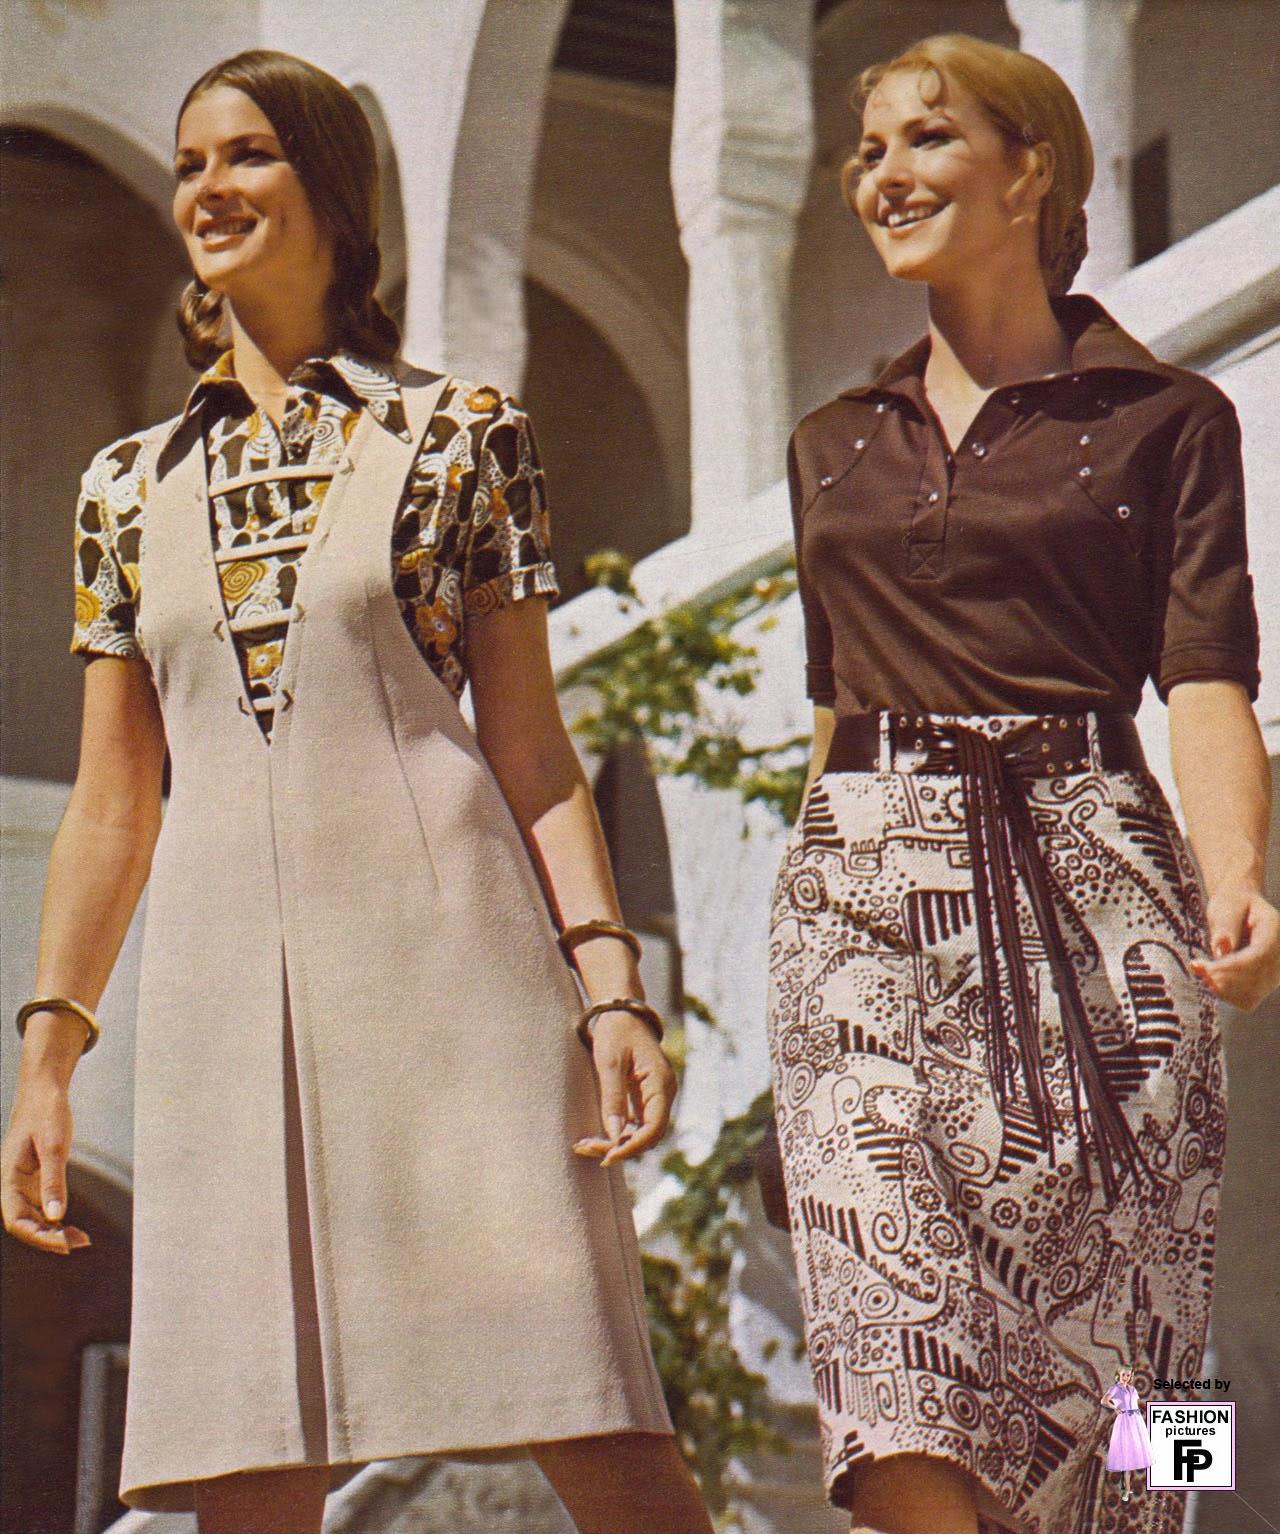 1970 clothing styles fashion